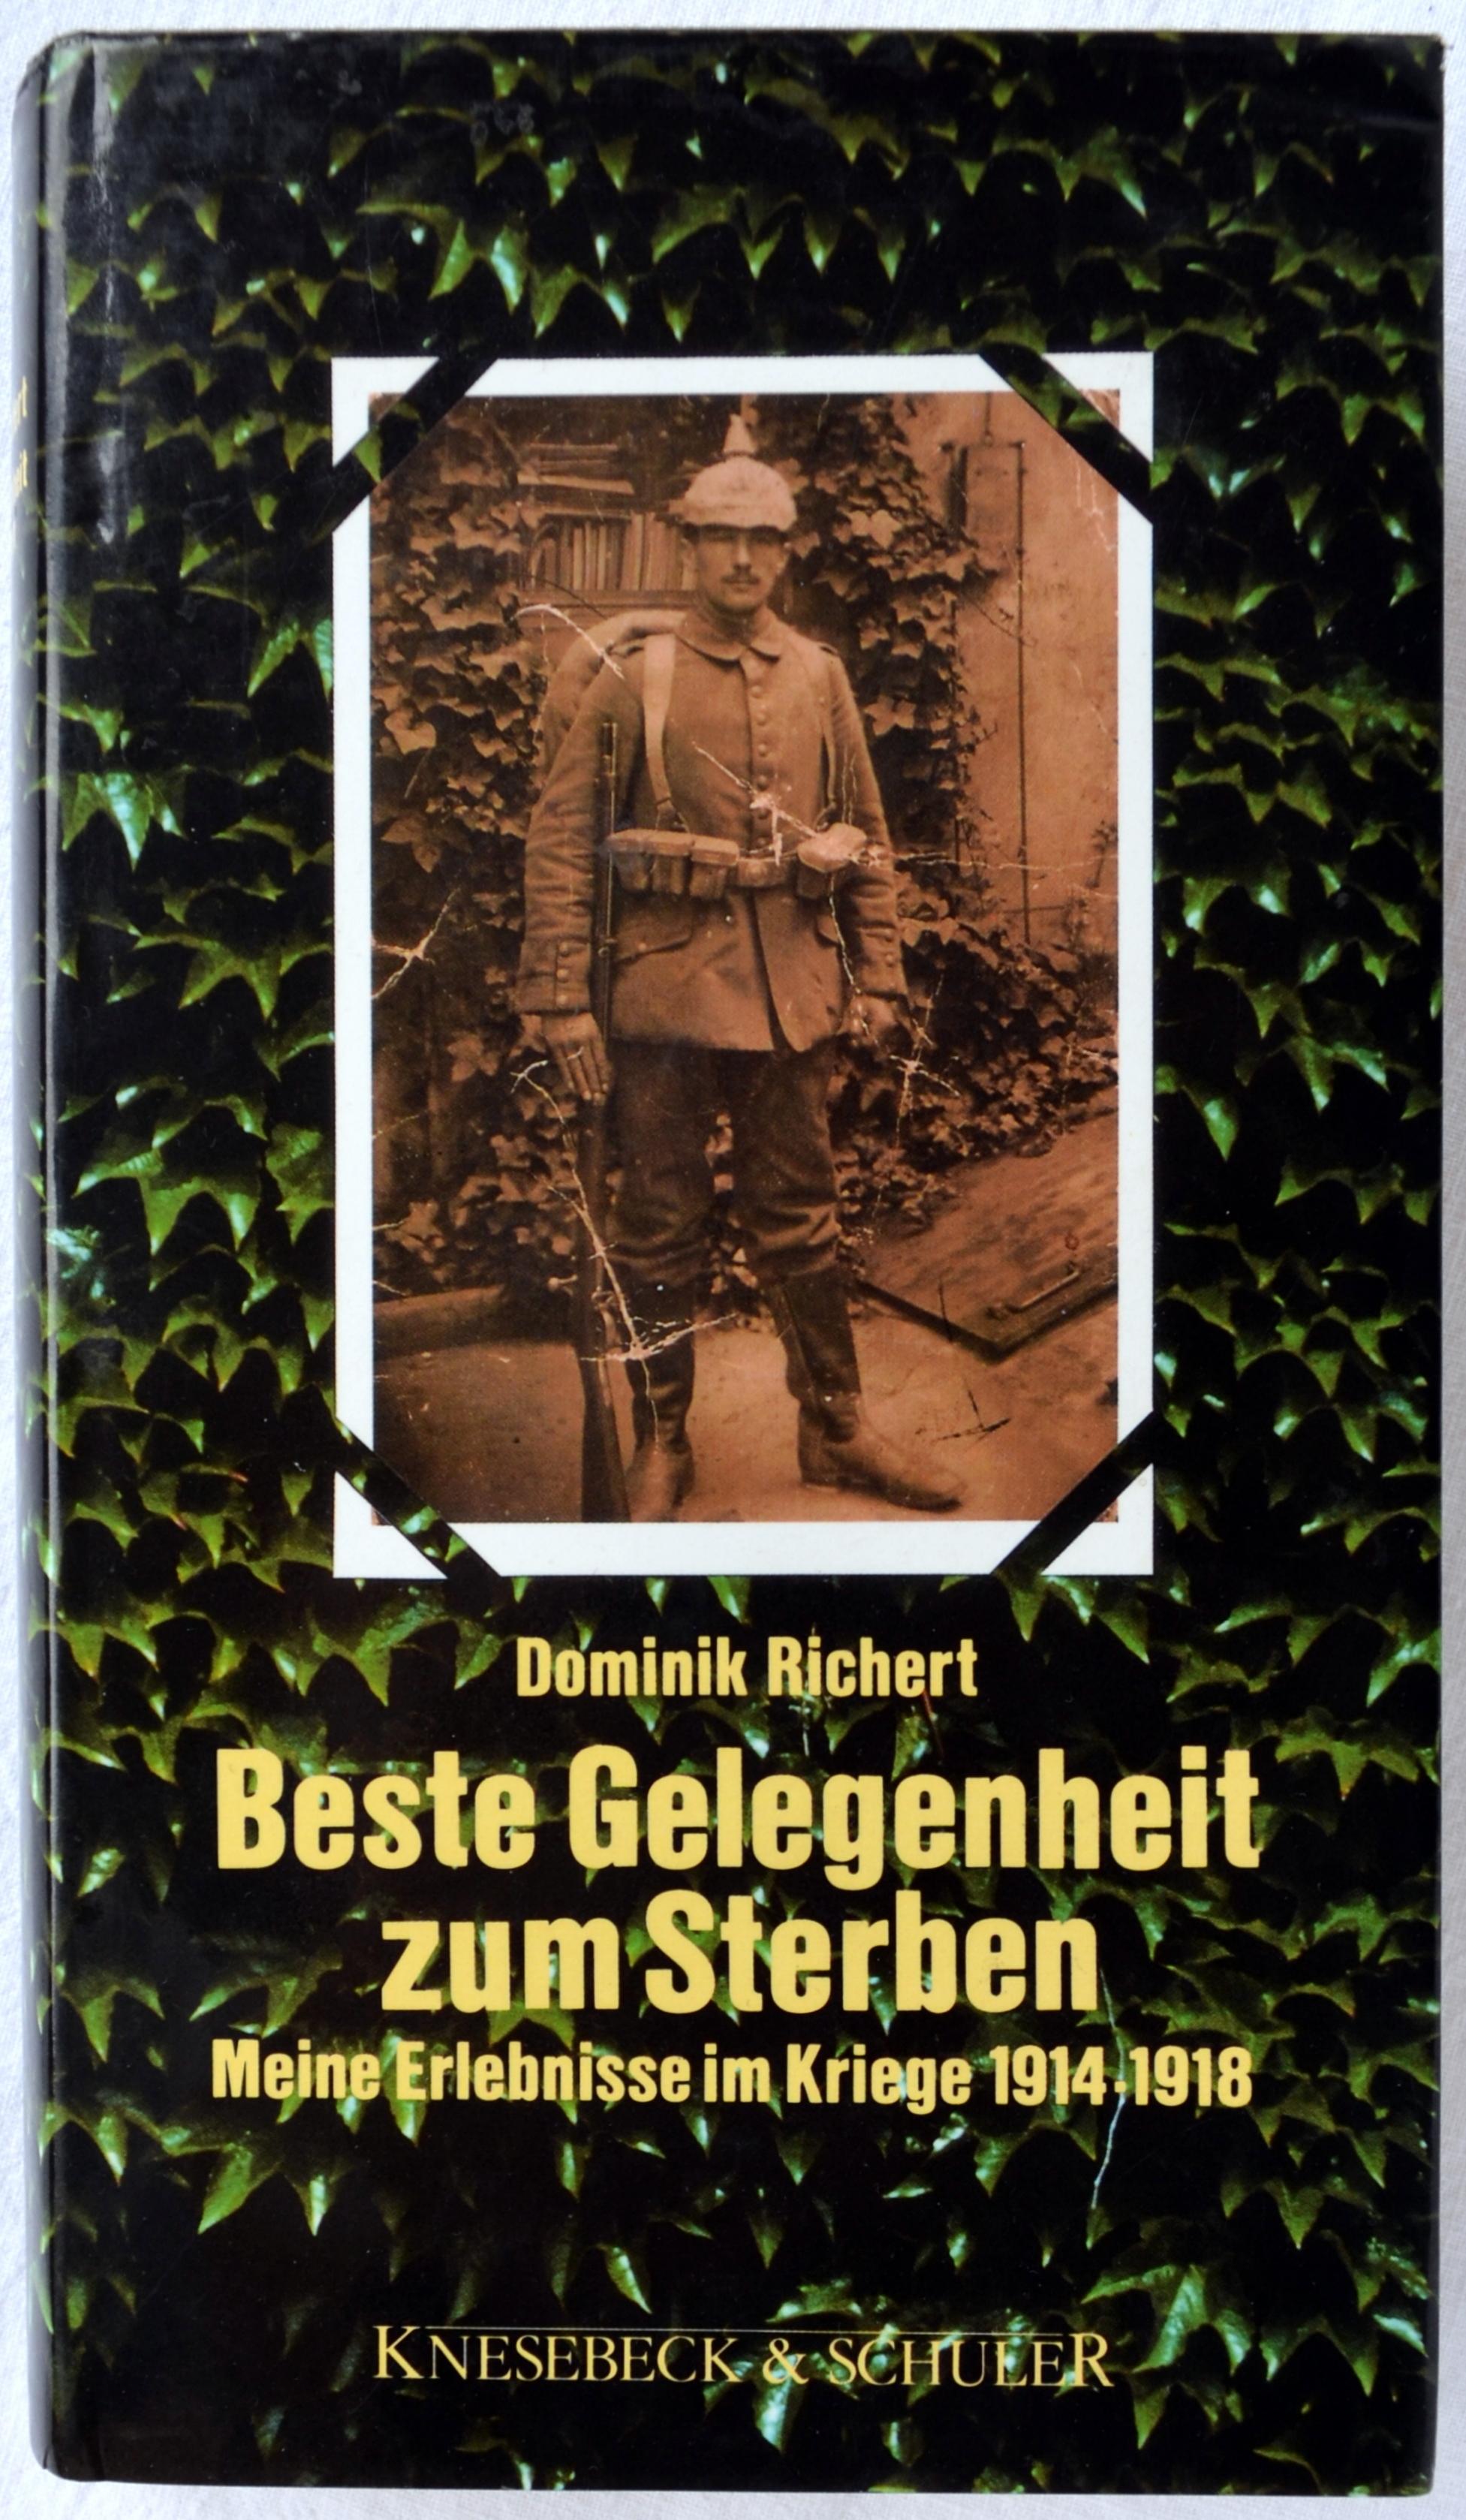 Buchcover: Richert Dominik - Beste Gelegenheit zum Sterben